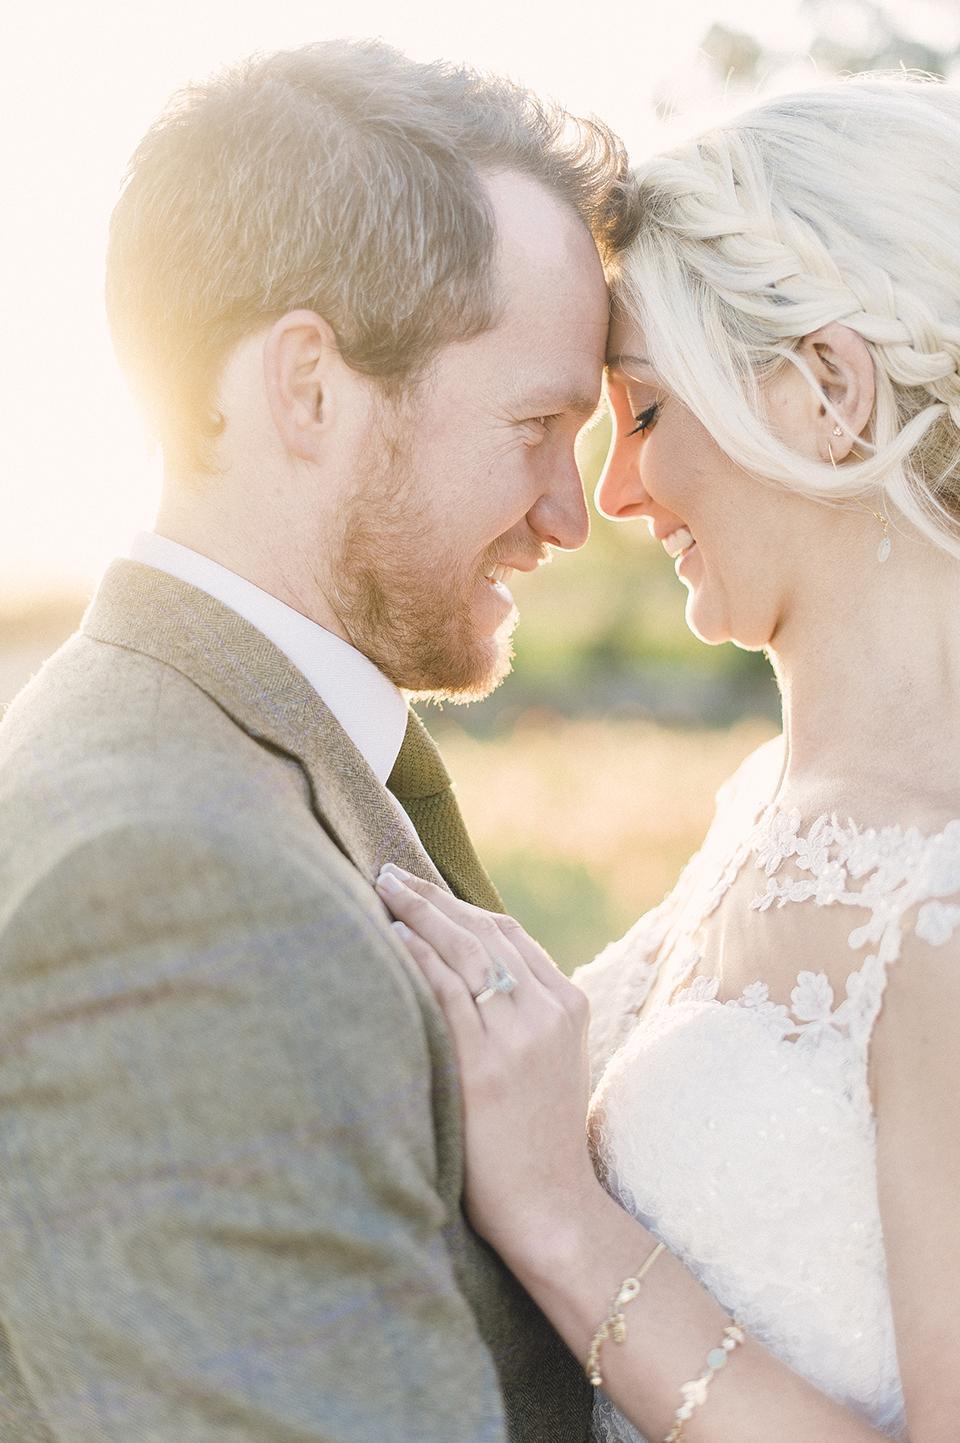 RyanParker_WeddingPhotographer_FineArt_CapeTown_Robertson_PatBusch_Hermanus_M&S_DSC_3511.jpg